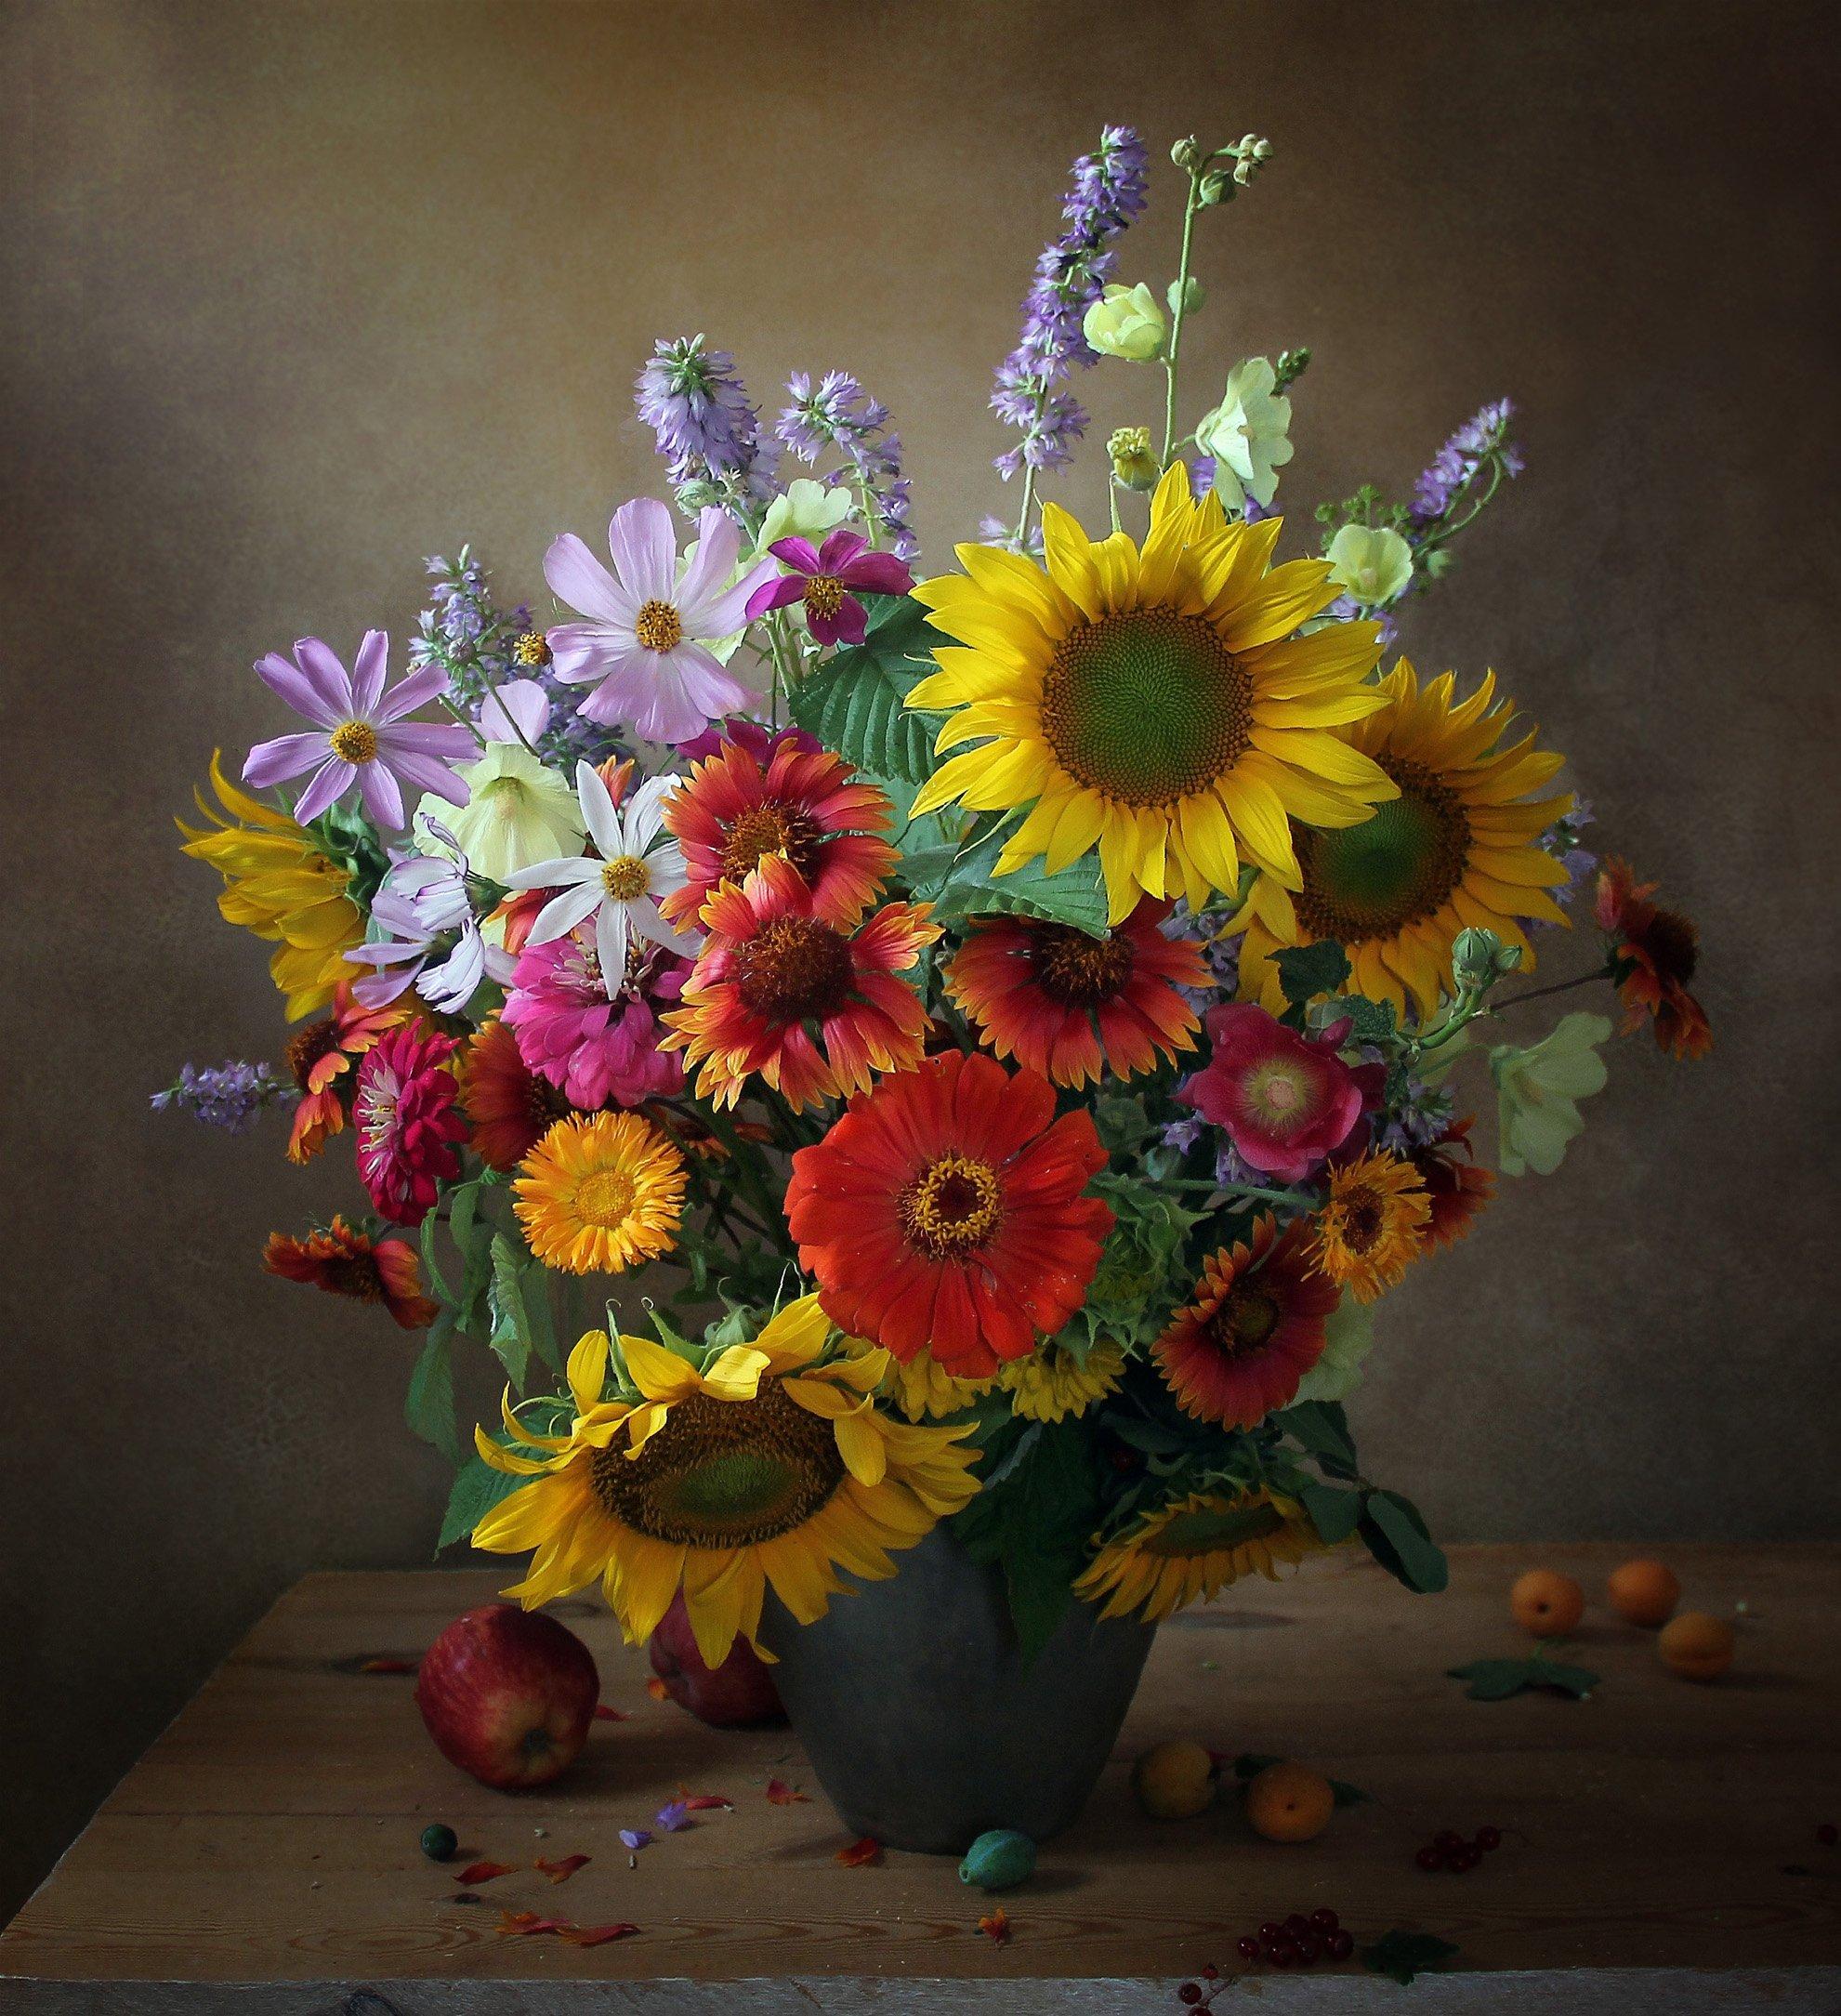 У лета много ярких красок Марина Филатова